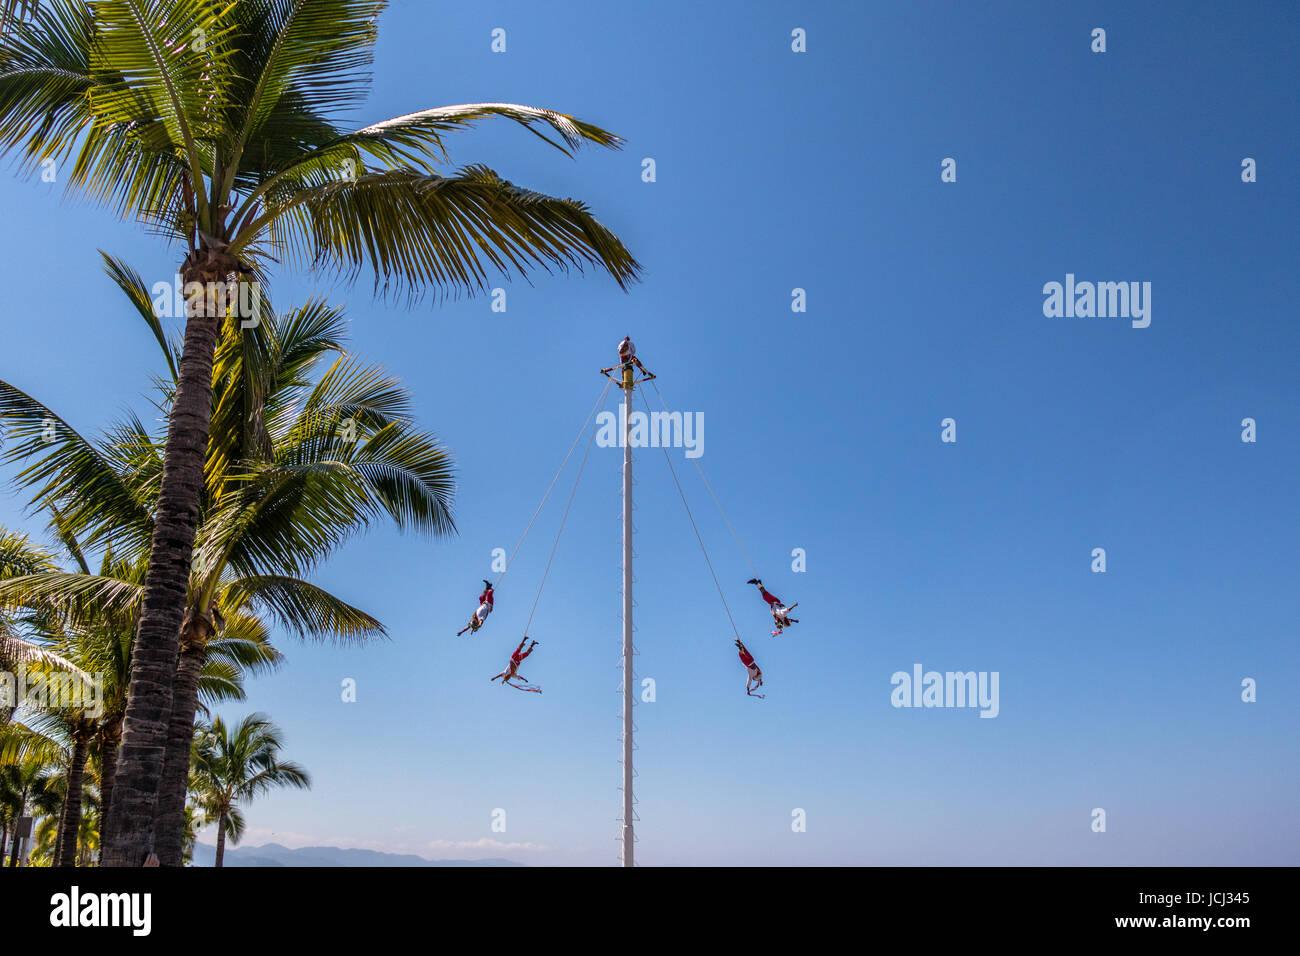 Dance of the Papantla Flyers (Voladores de Papantla) - Puerto Vallarta, Jalisco, Mexico - Stock Image